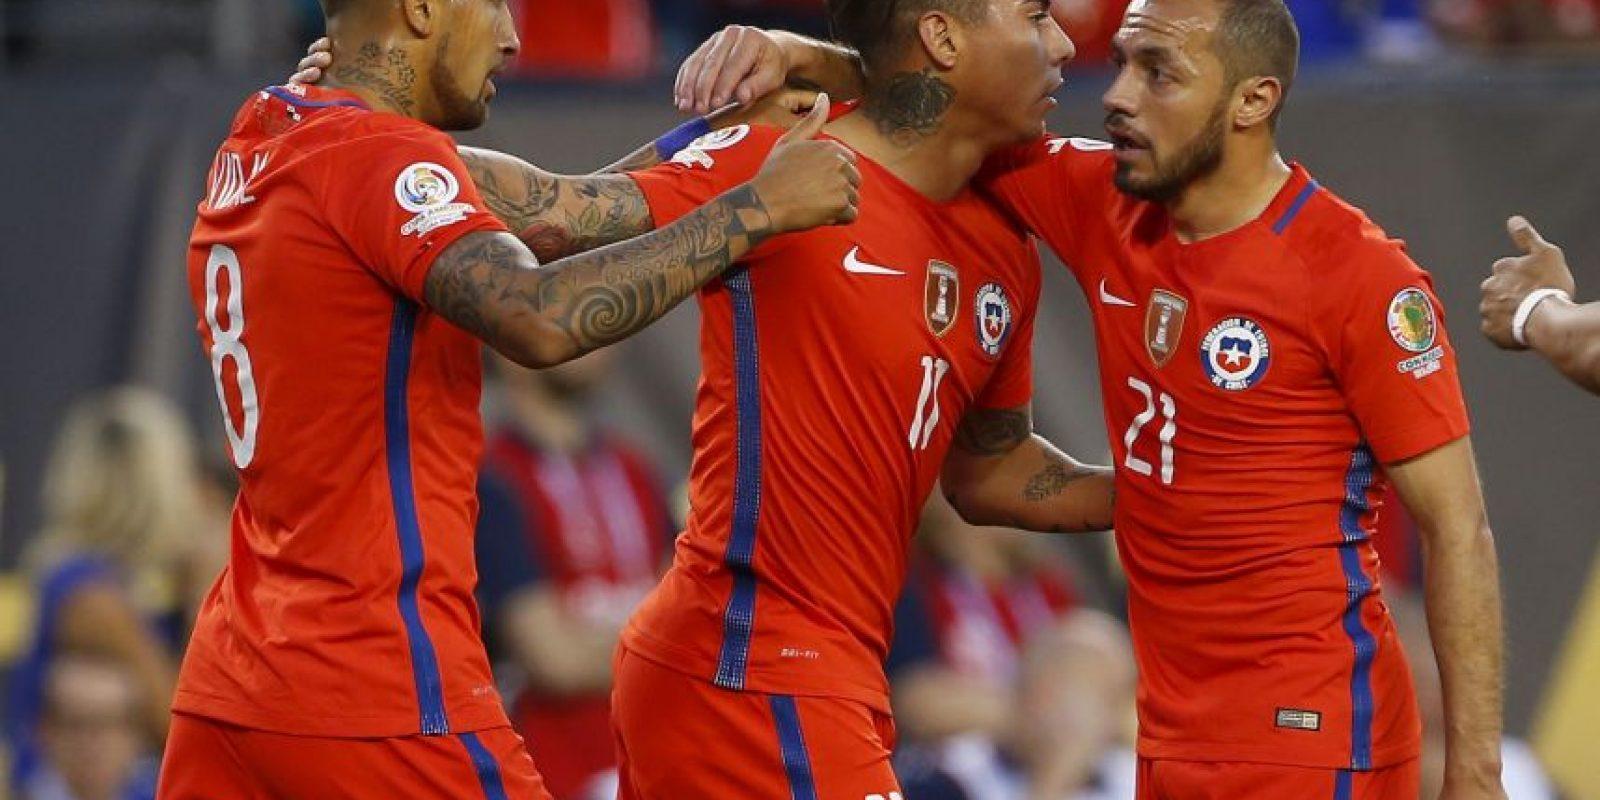 Chile empezó a encontrar su forma ante la débil Panamá Foto:Getty Images